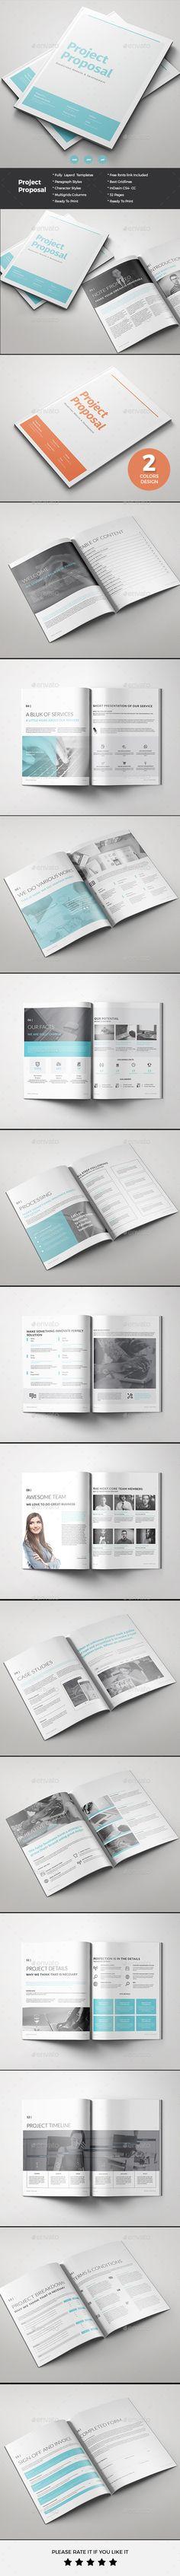 Proposal Text fonts Creative design